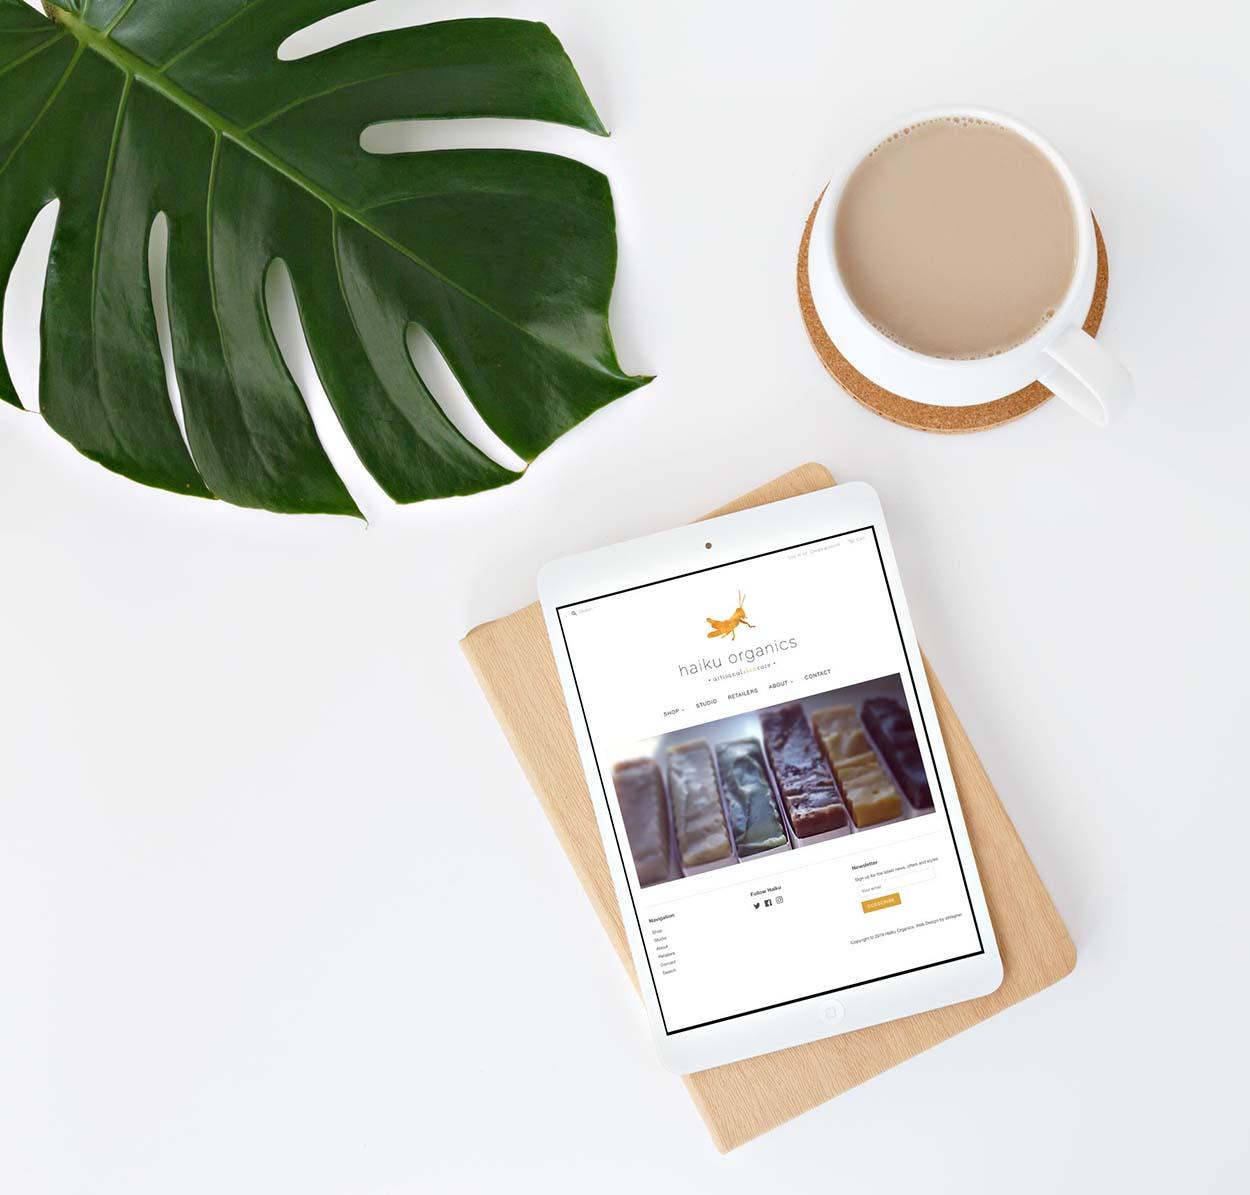 Haiku Organics Skincare Website | Shopify Web Design | Boise, Idaho | eWagner